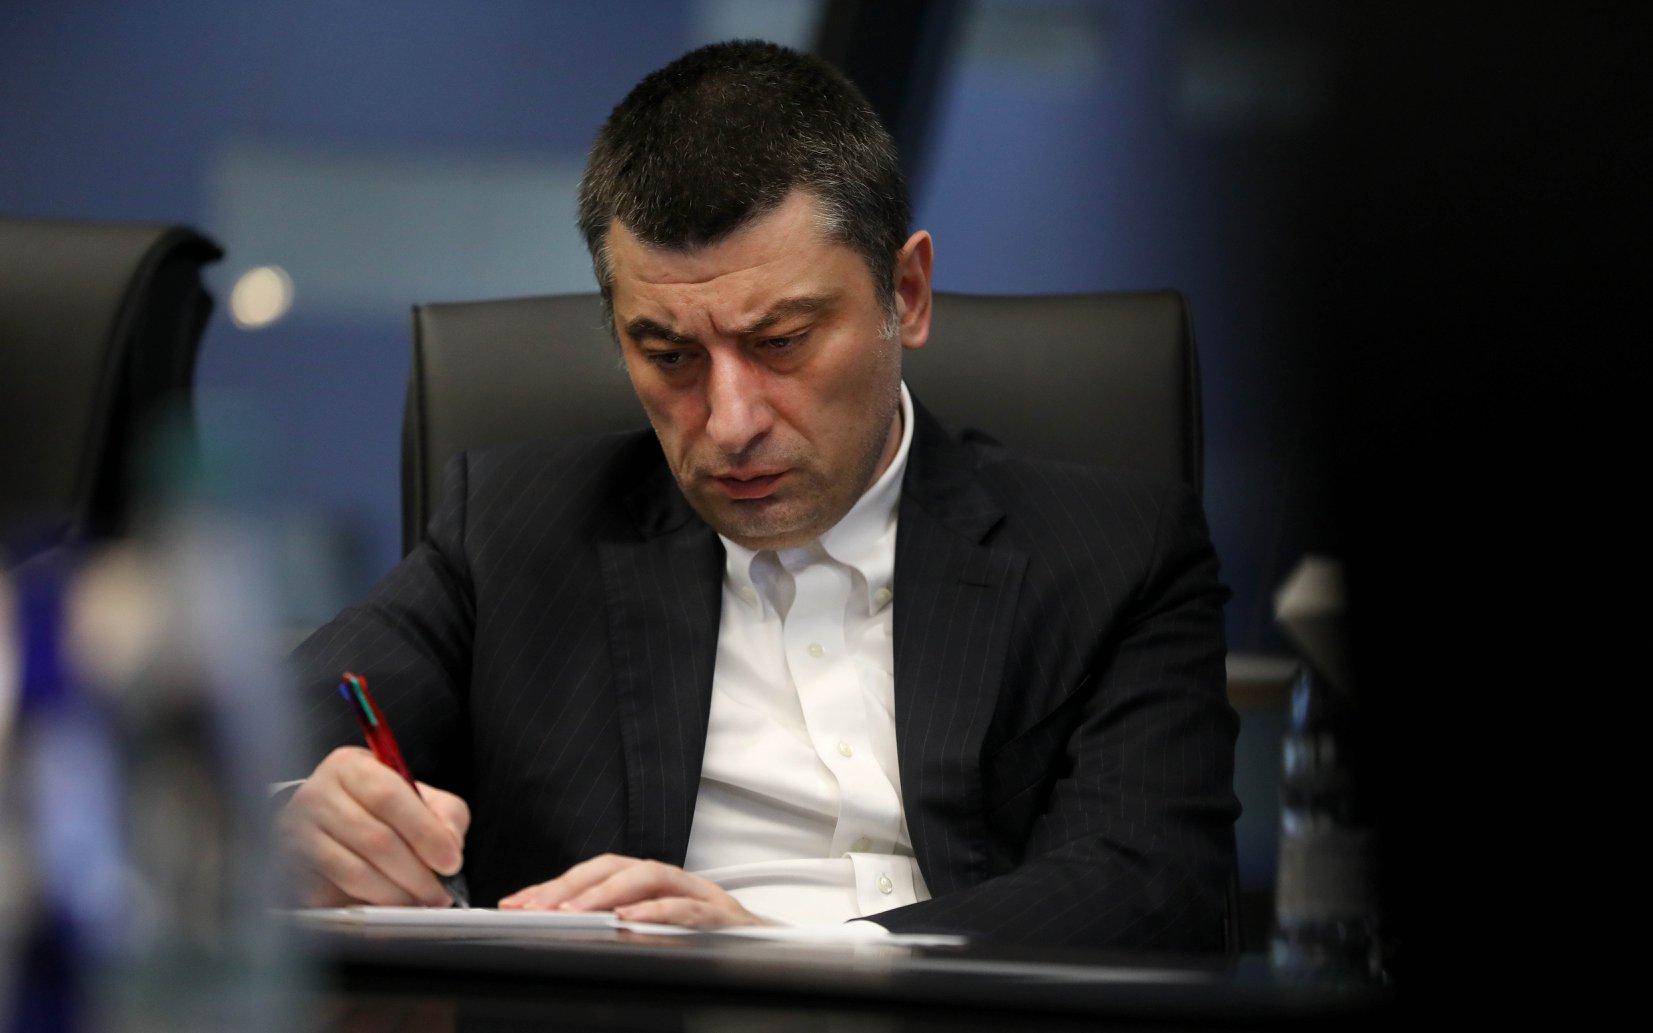 Giorgi Gakharia 33 #новости Георгий Гахария, Гига Угулава, Ираклий Окруашвили, помилование